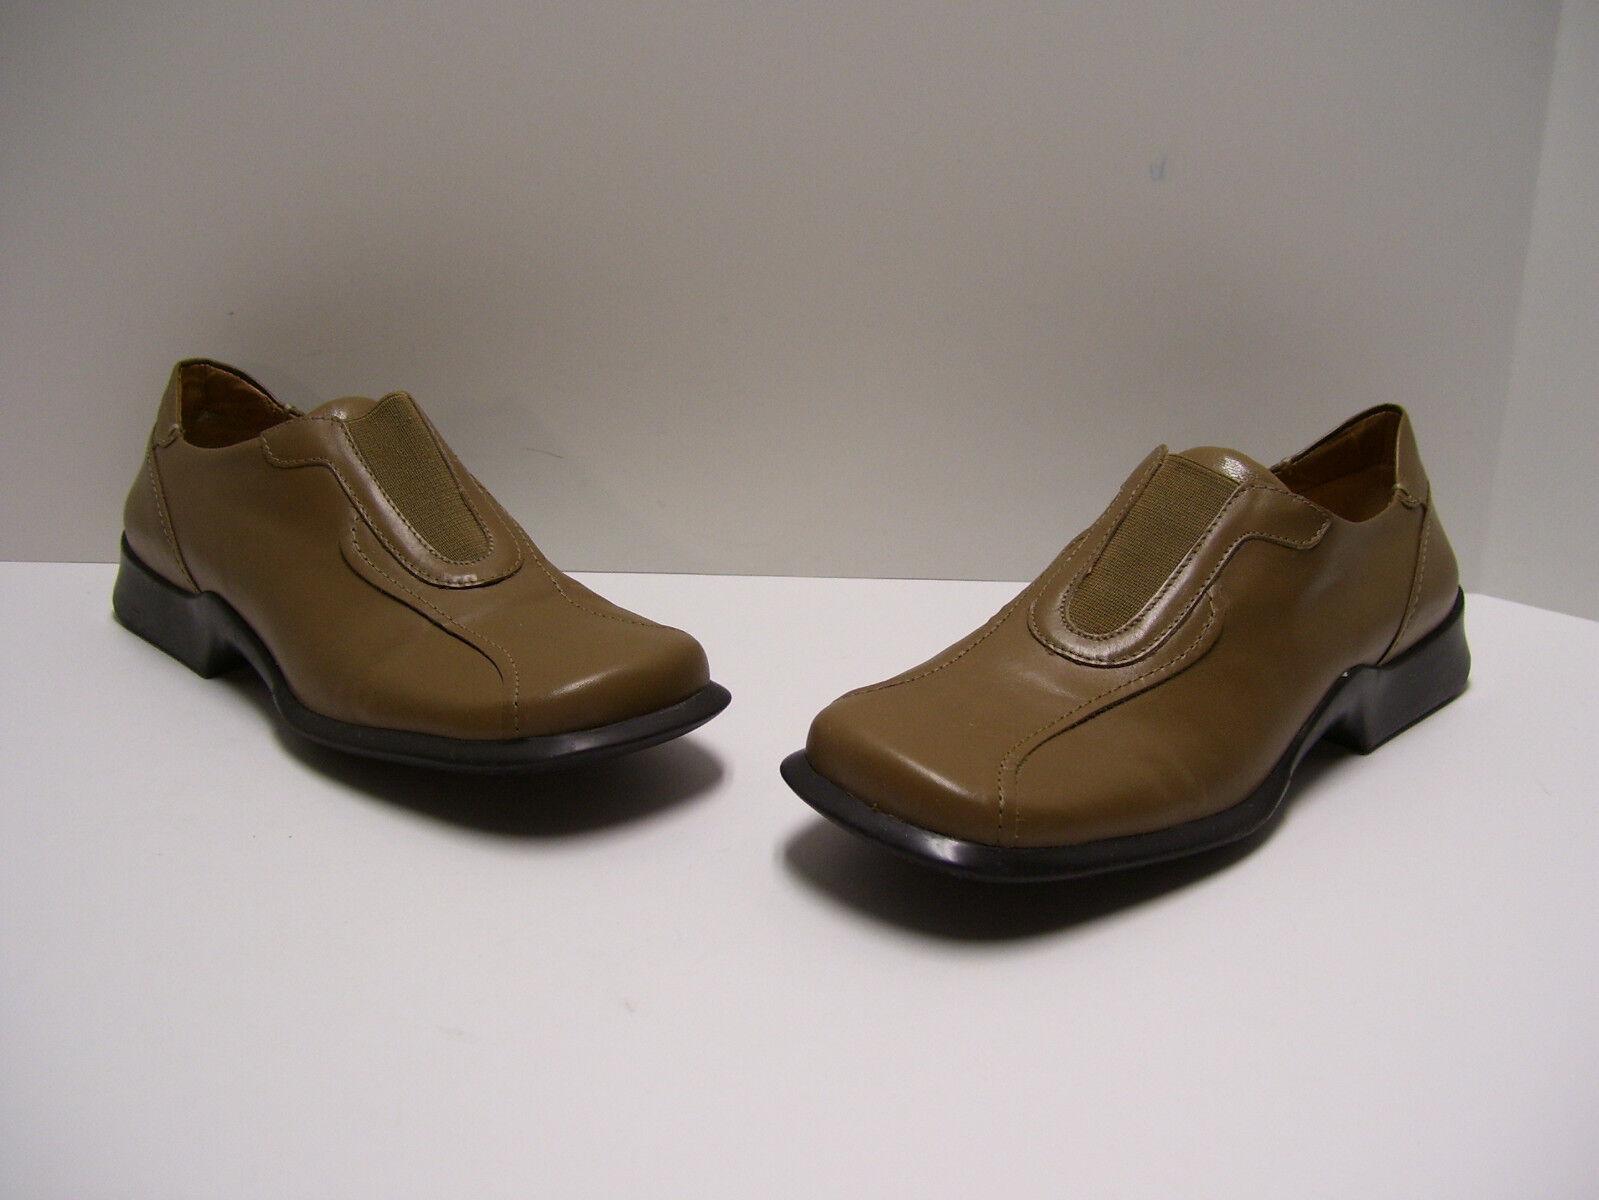 Franco Sarto Womens Shoes Sz 8 M M 8 US Camel Calf Slippers Slipons Dress Casual 70ddc0